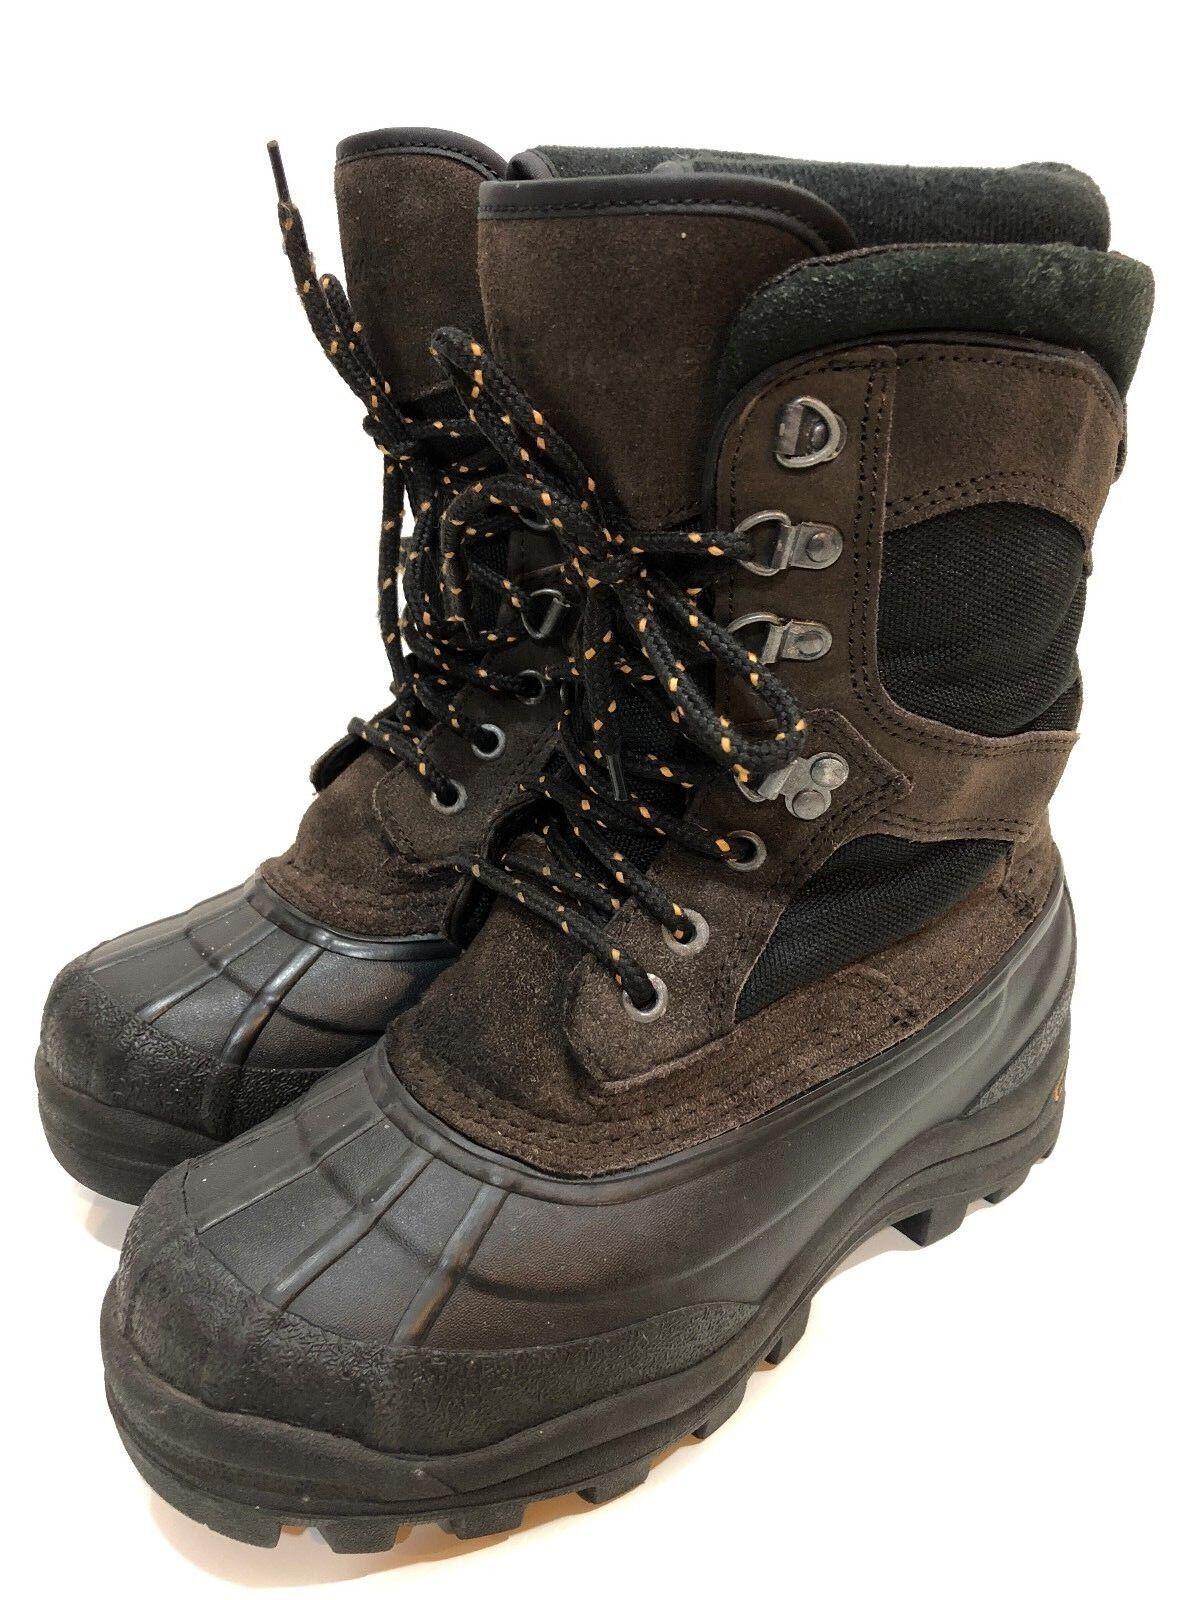 LaCrosse Outpost II Women's Winter Snow Boots Size 9 M